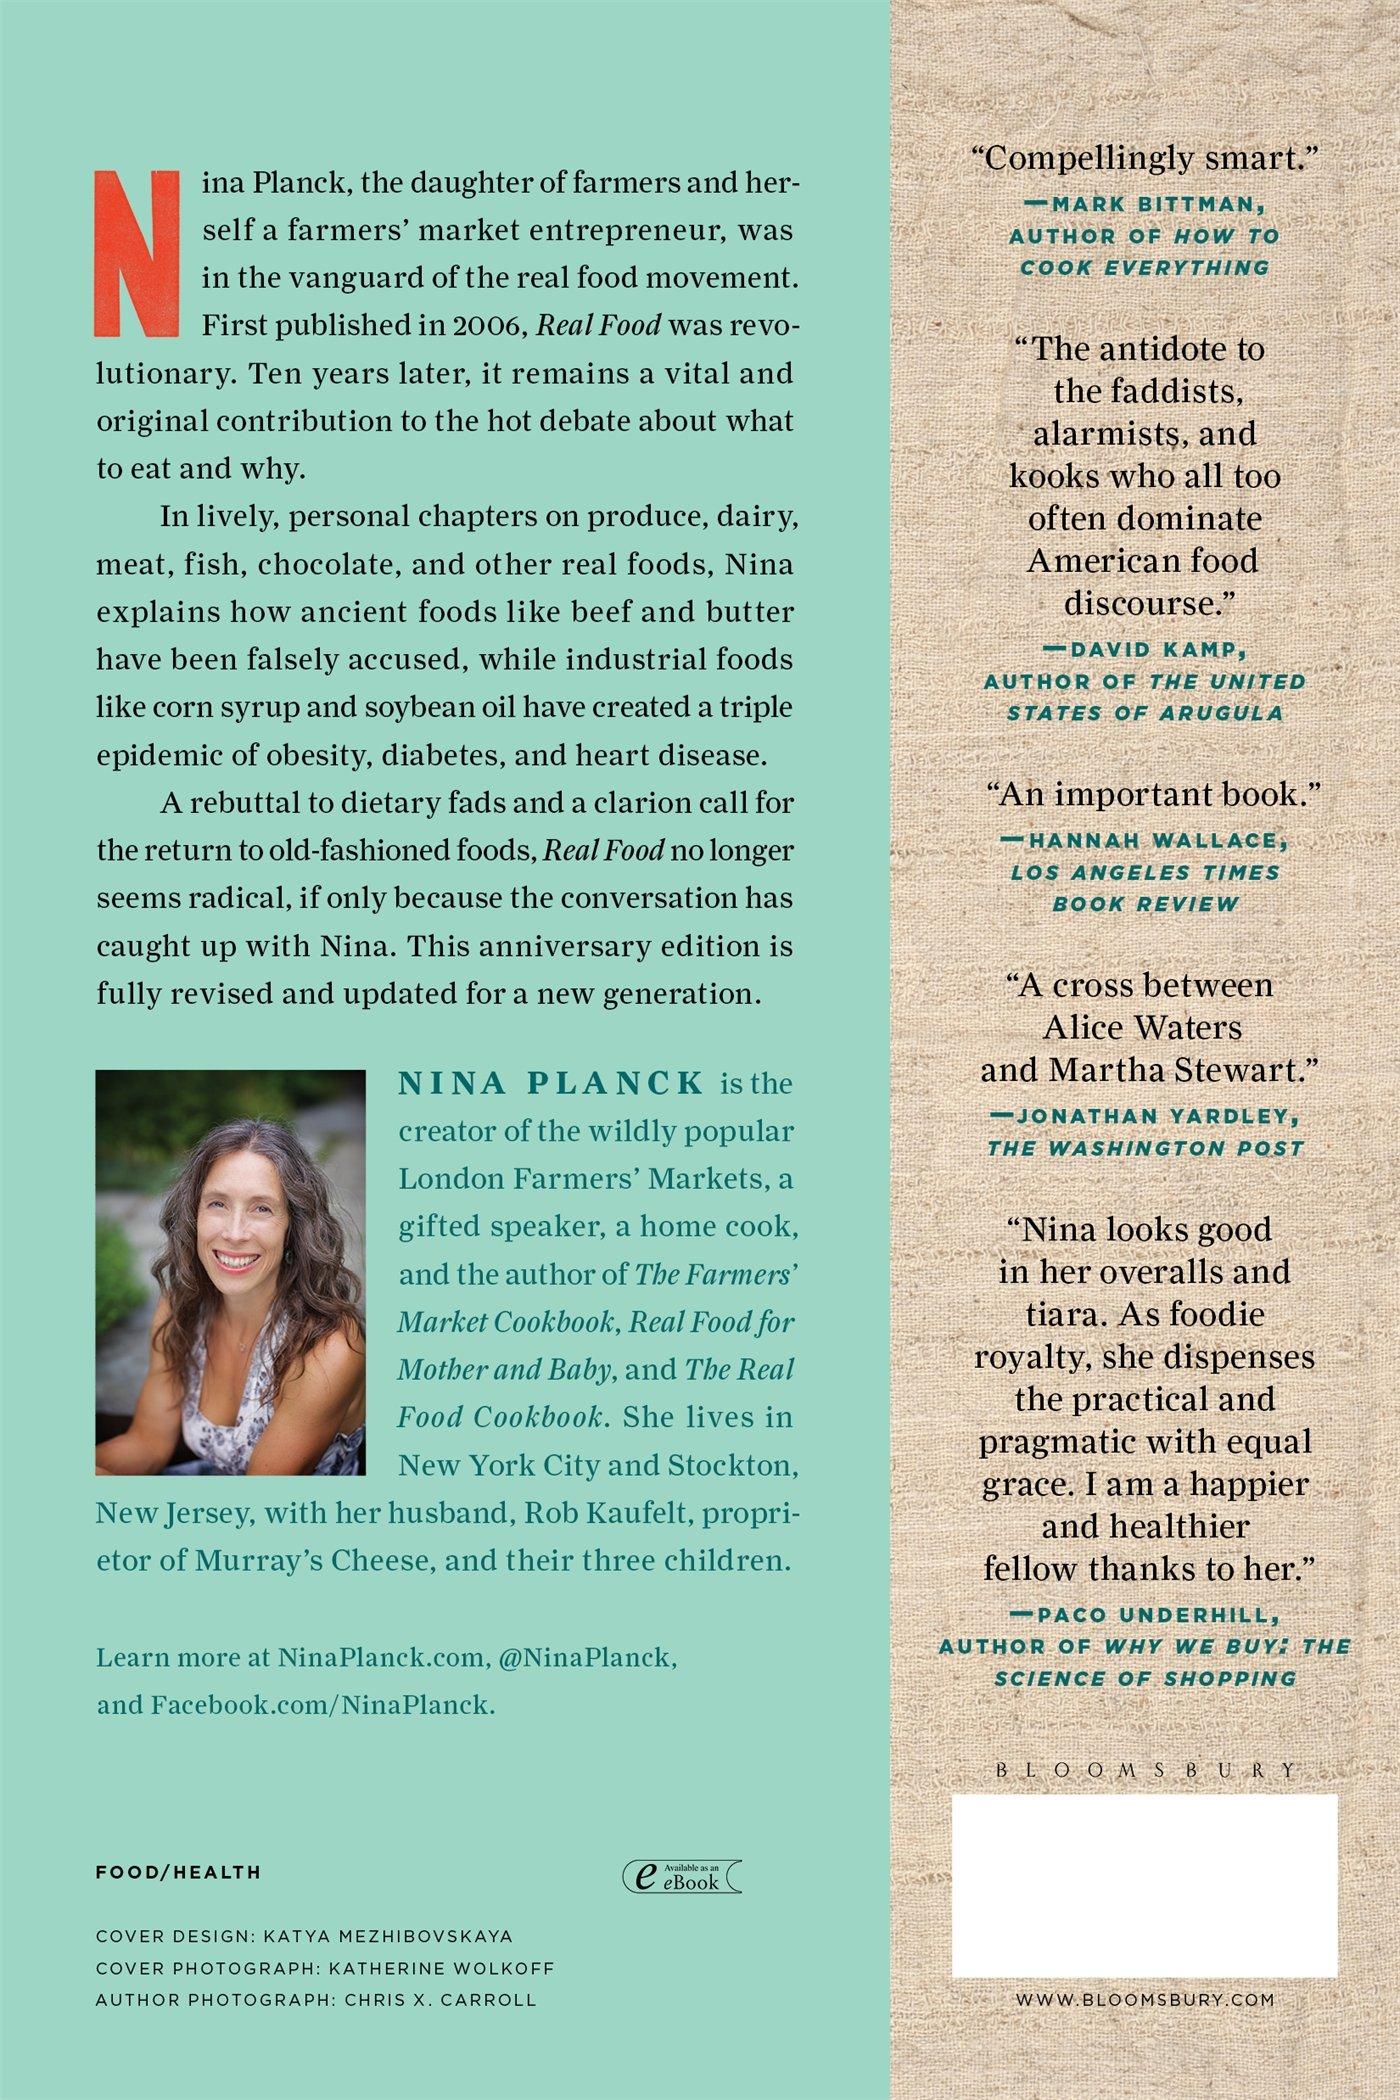 bd330278e7 Real Food: What to Eat and Why: Nina Planck, Nina Teicholz: 9781632864581:  Amazon.com: Books